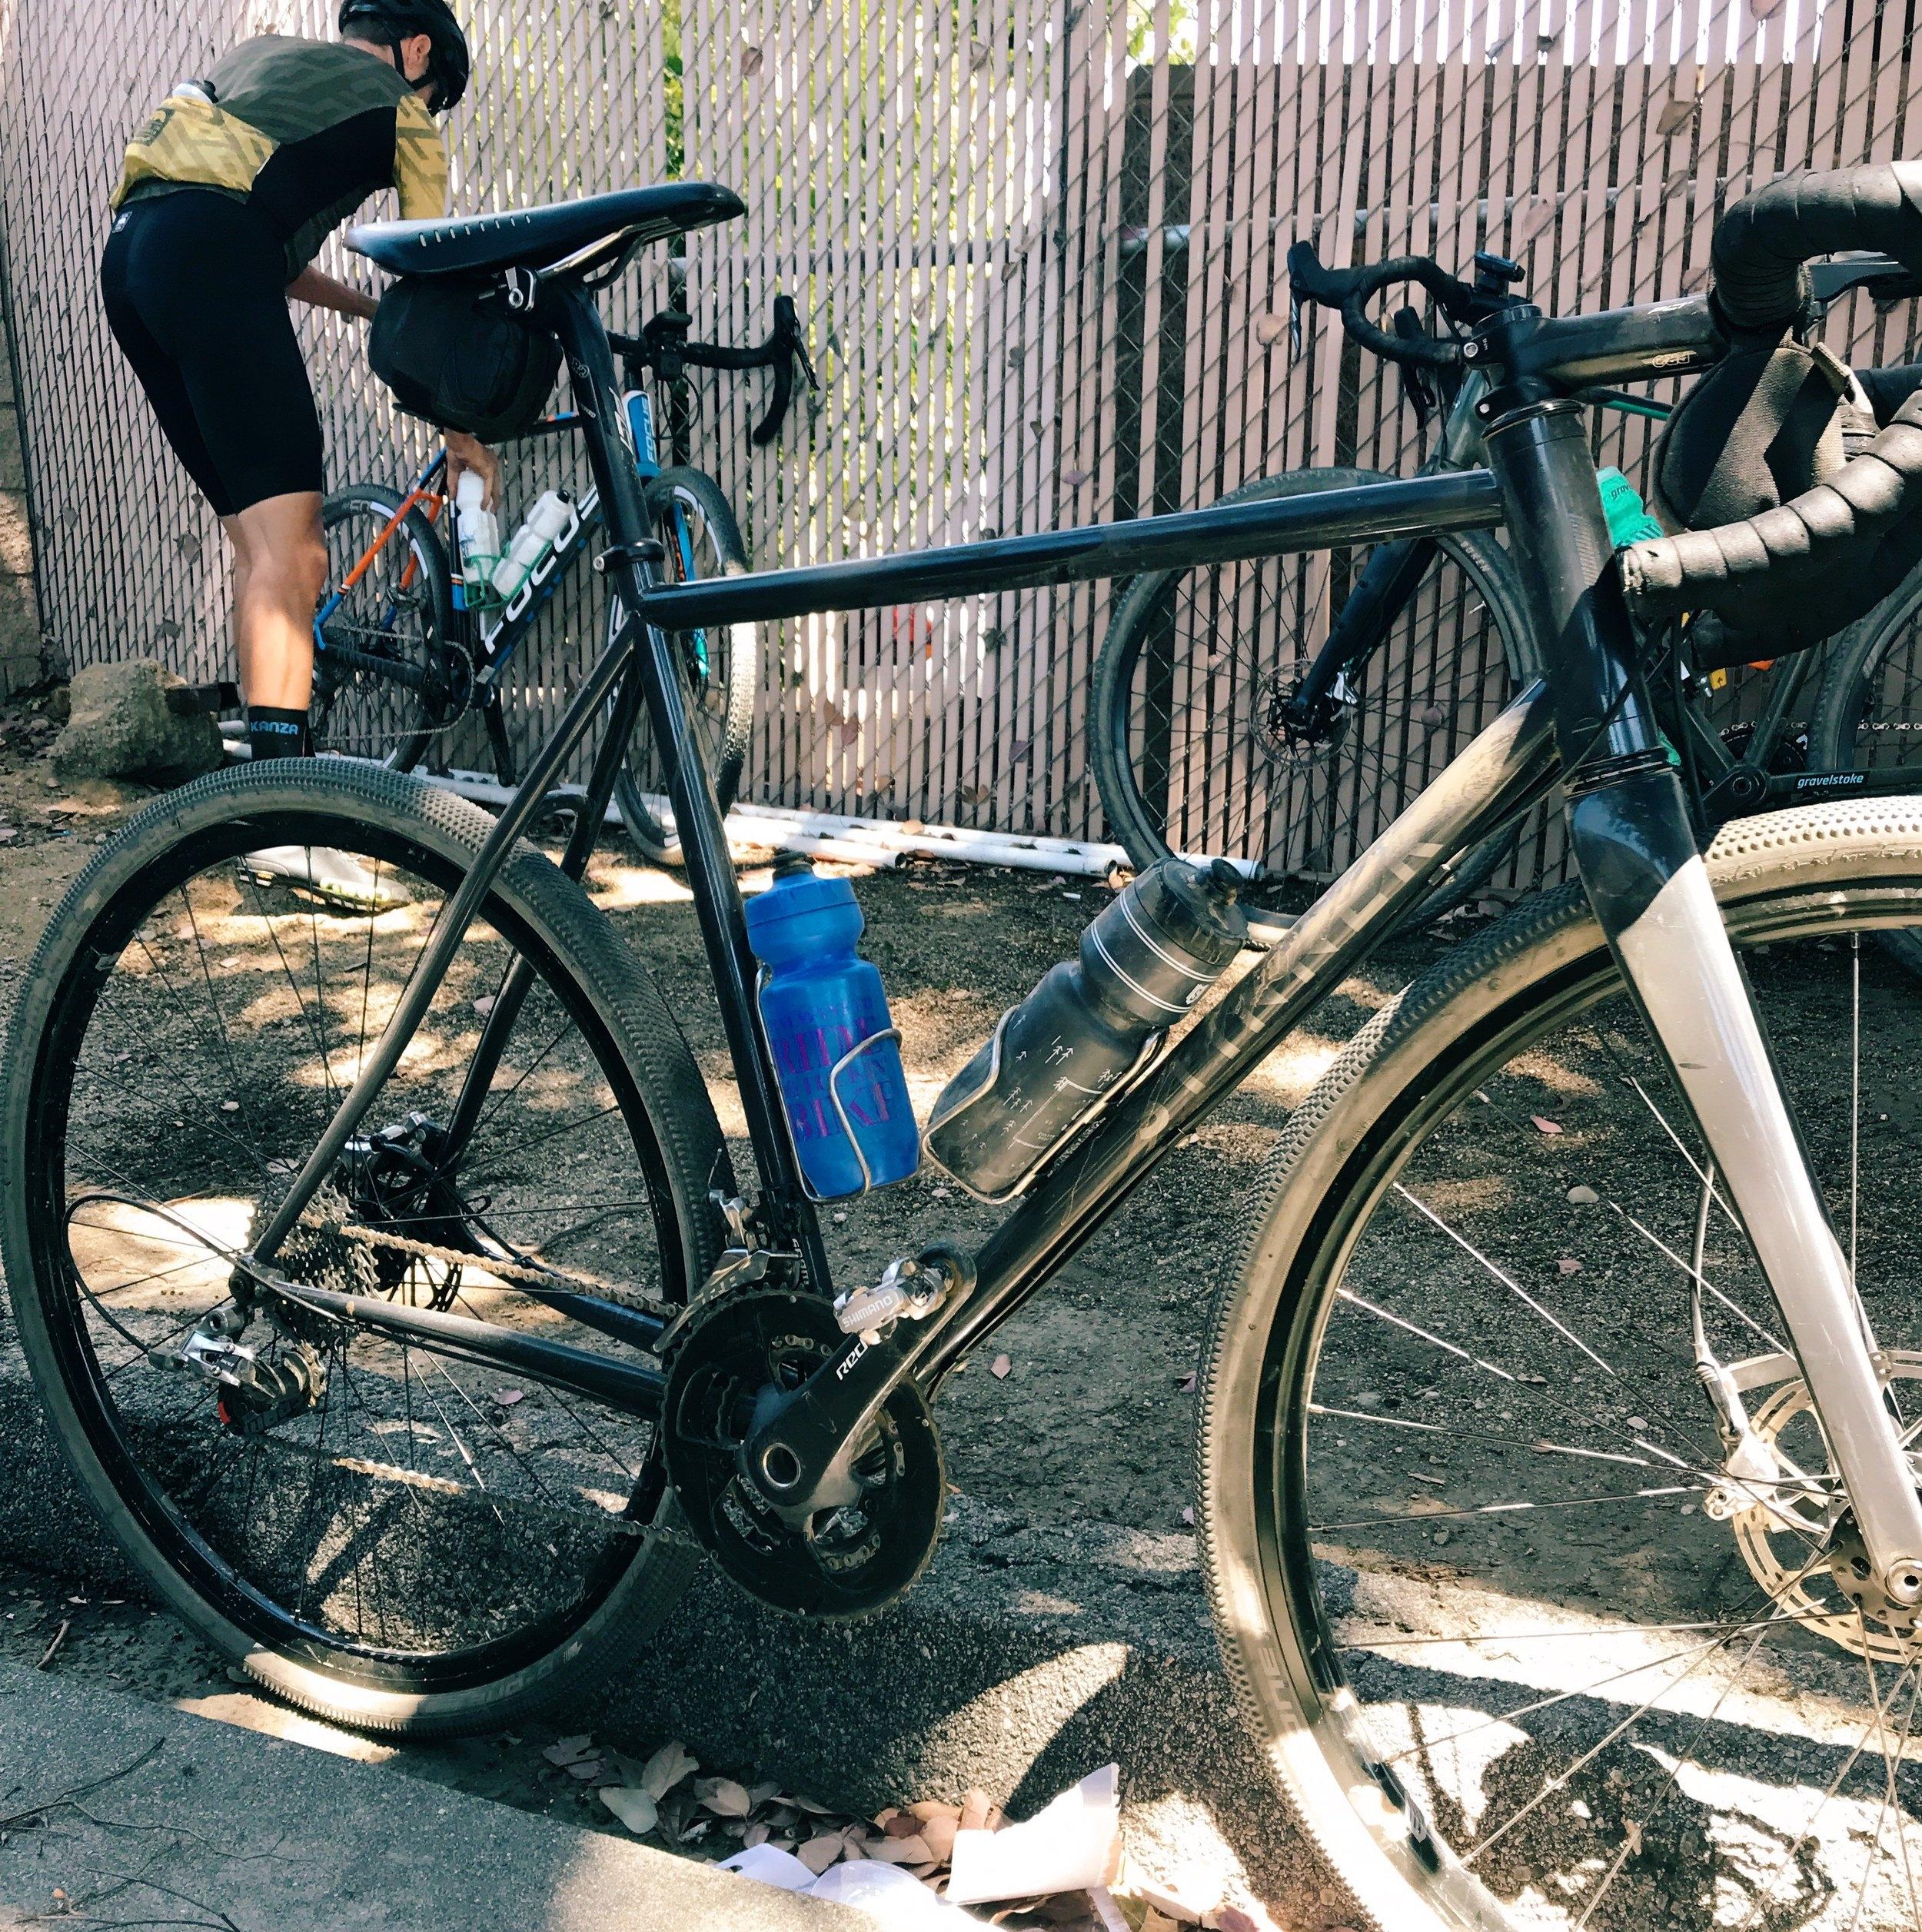 CJ's very nice Stinner Gravel bike